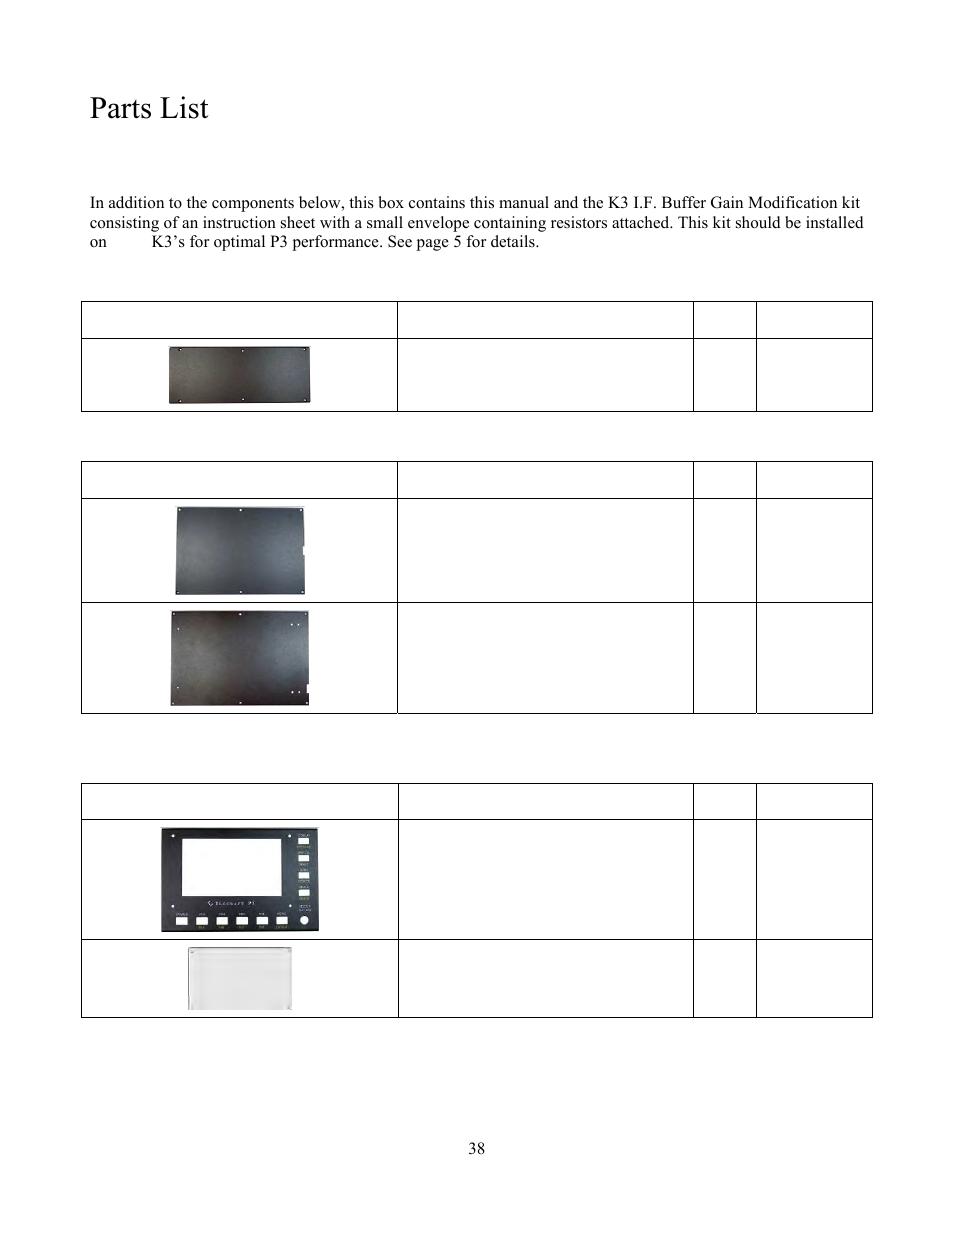 Parts list | Elecraft P3 High-Performance Panadapter Manual User